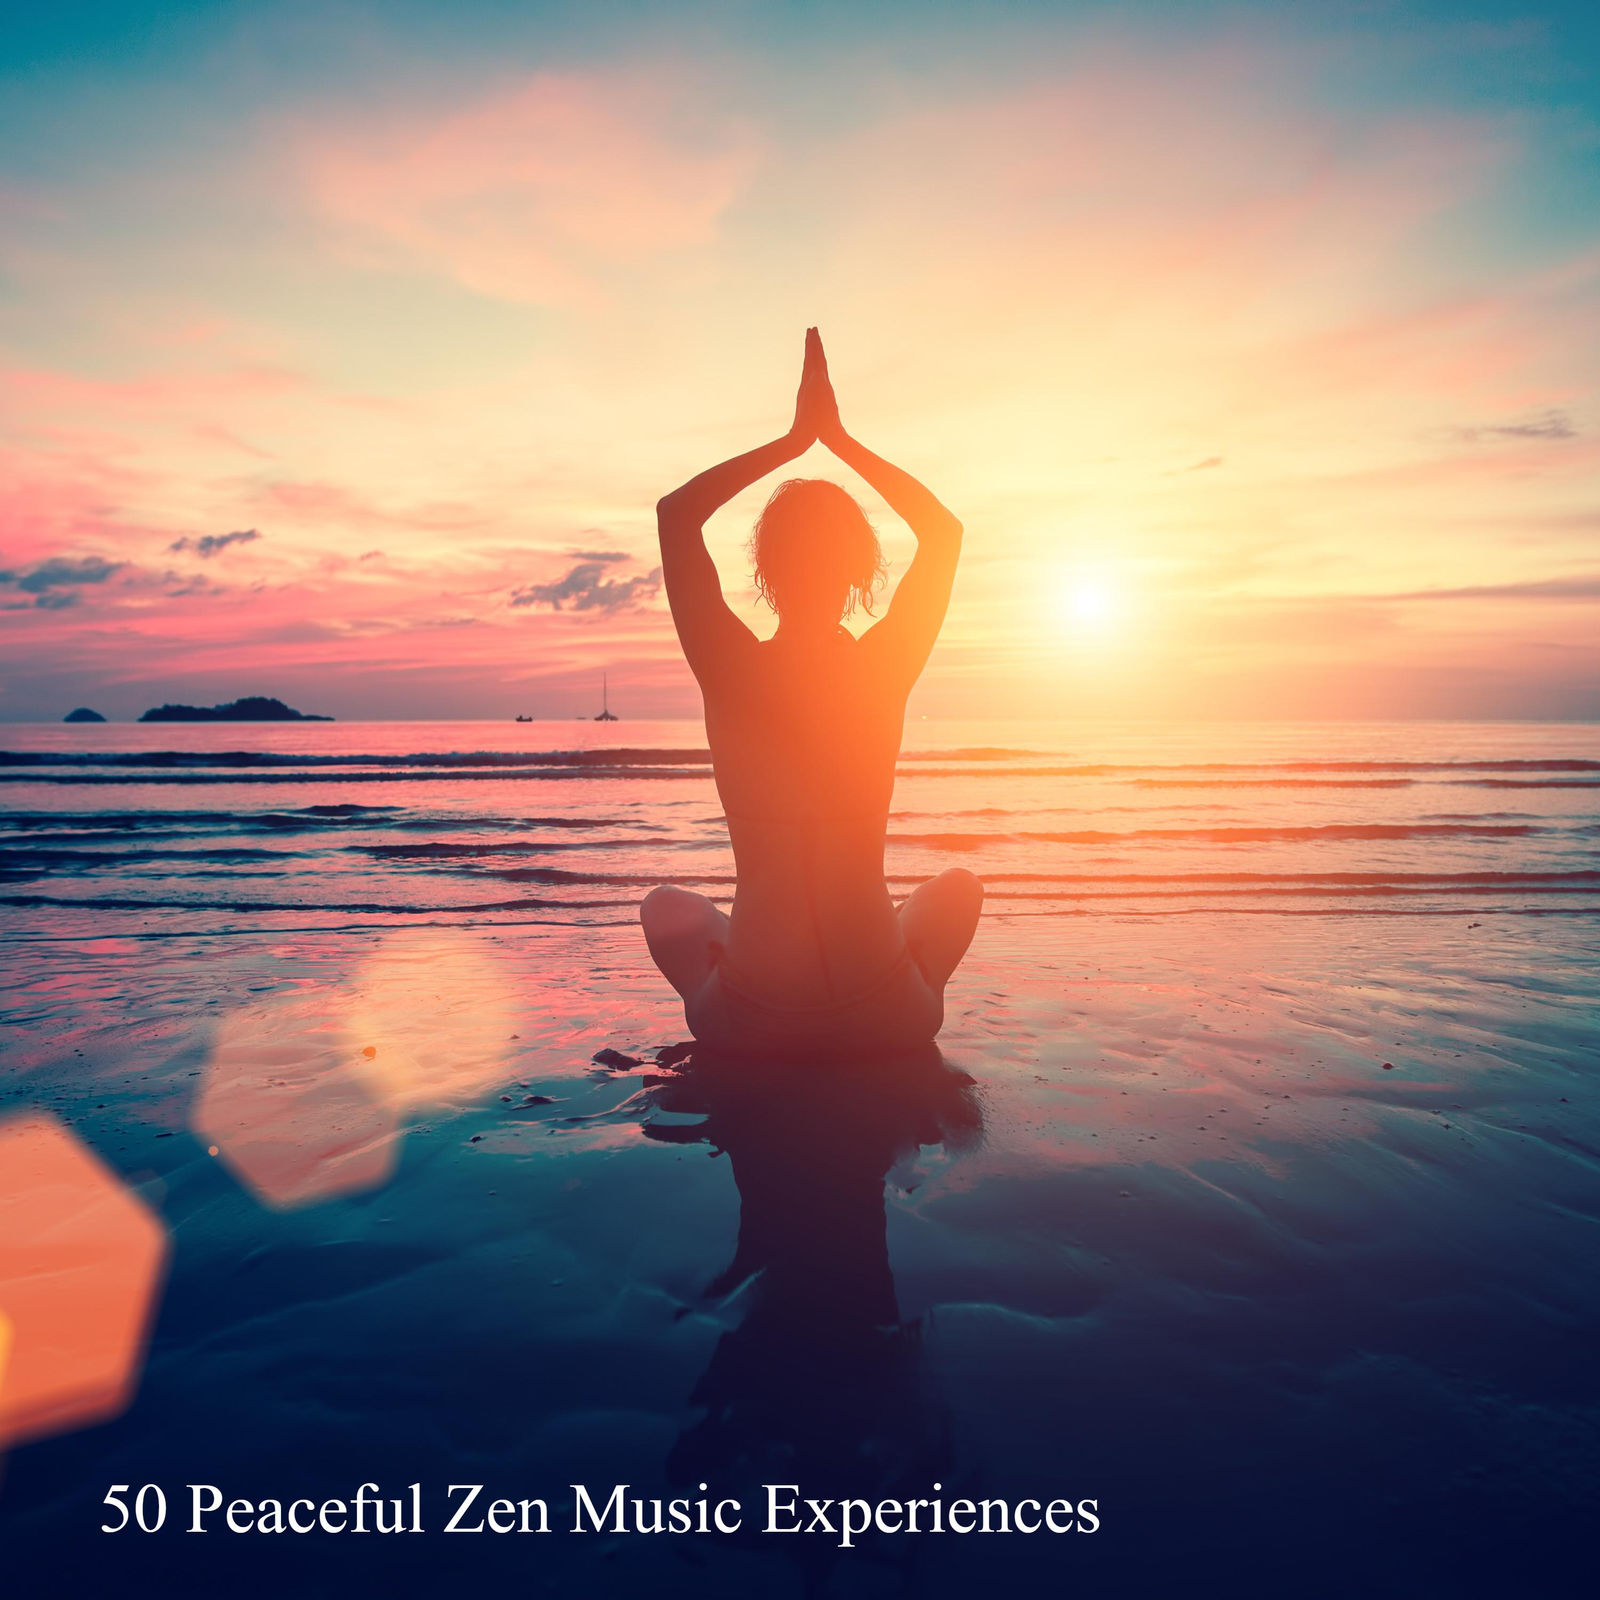 50 Peaceful Zen Music Experiences